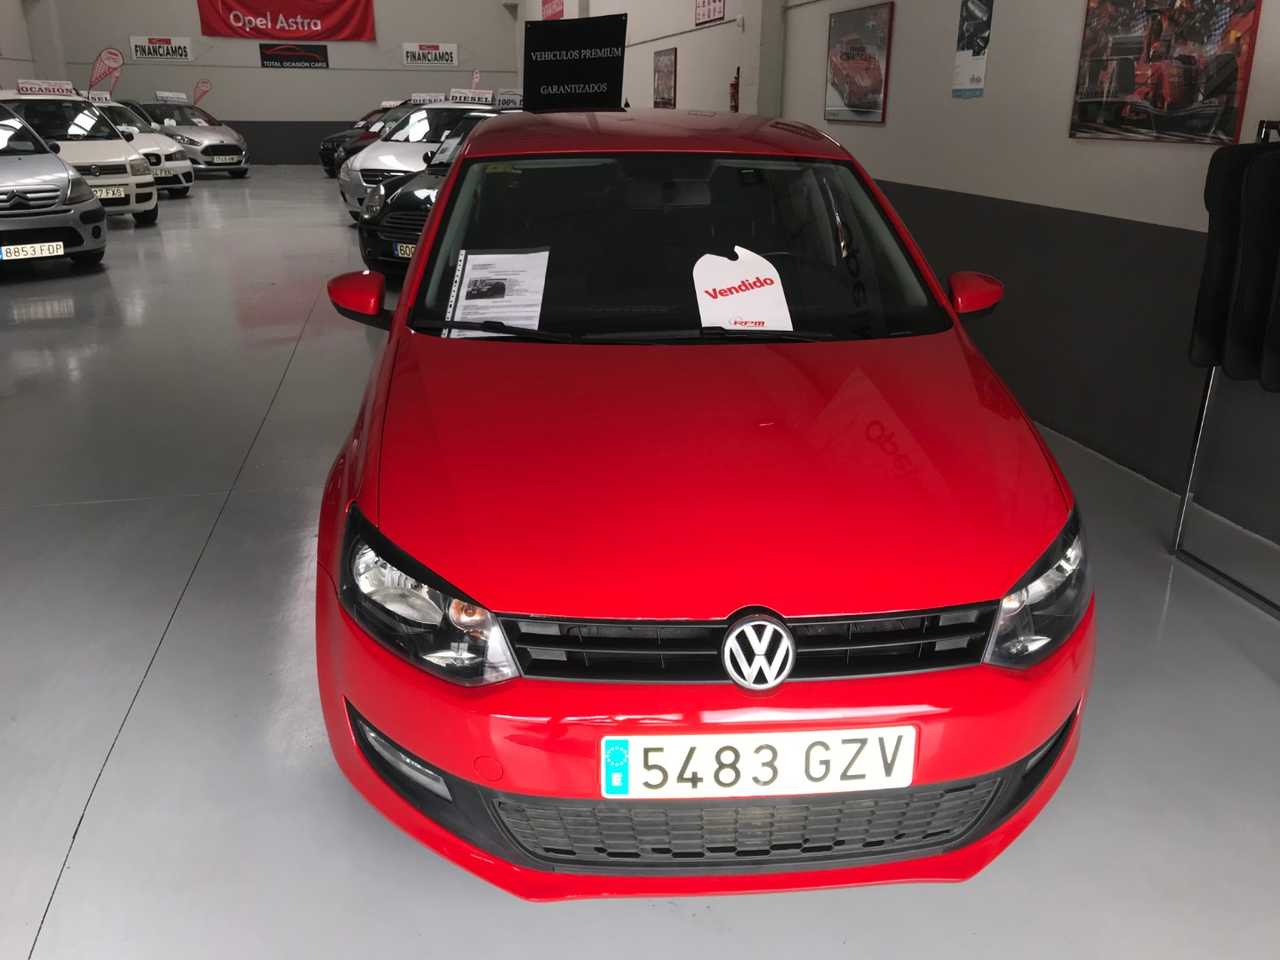 Volkswagen Polo VOLKSWAGEN Polo 1.4 85cv Advance   - Foto 1